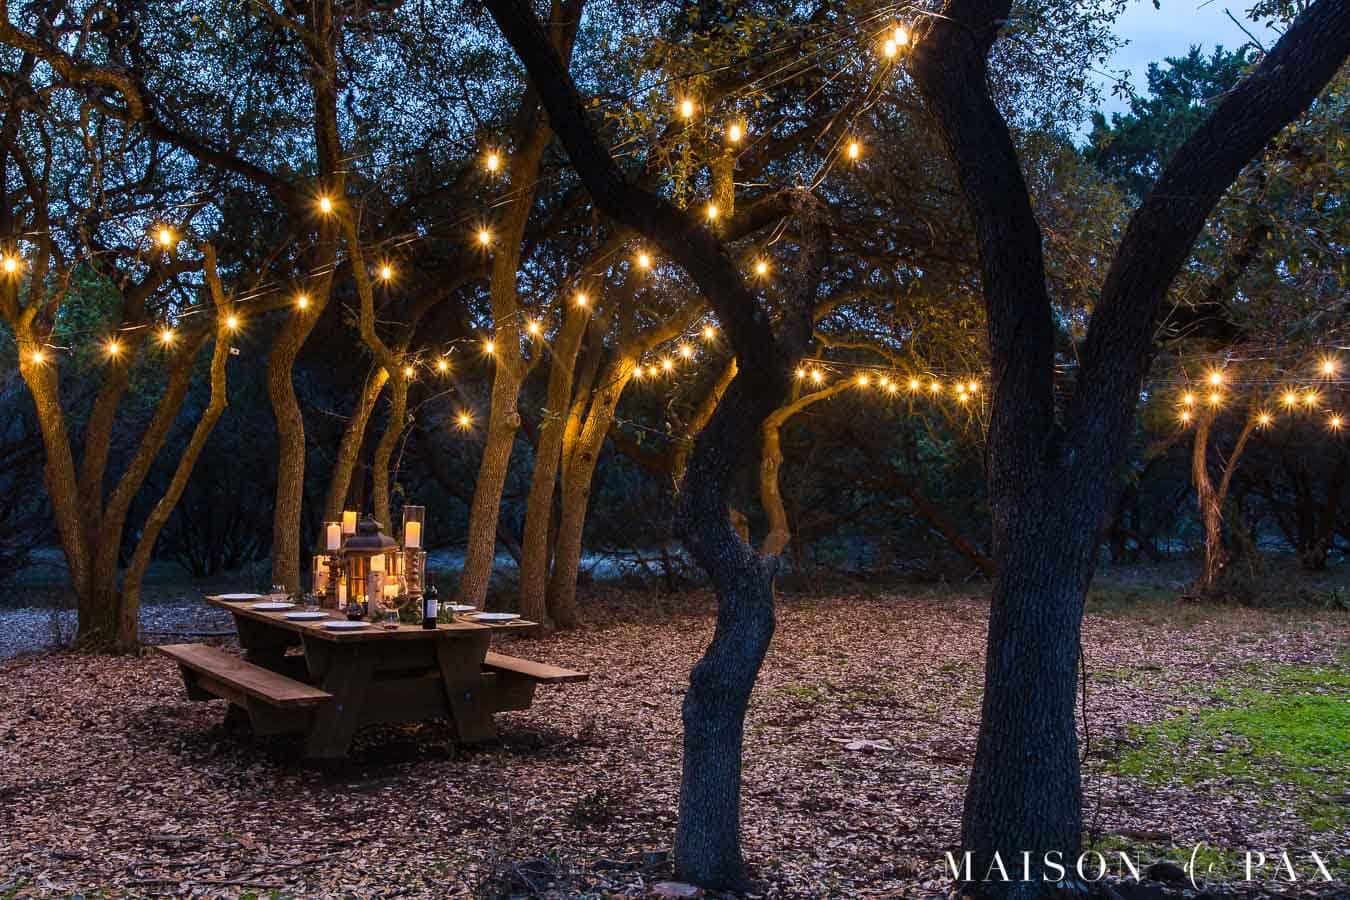 How To Hang Outdoor String Lights Maison De Pax